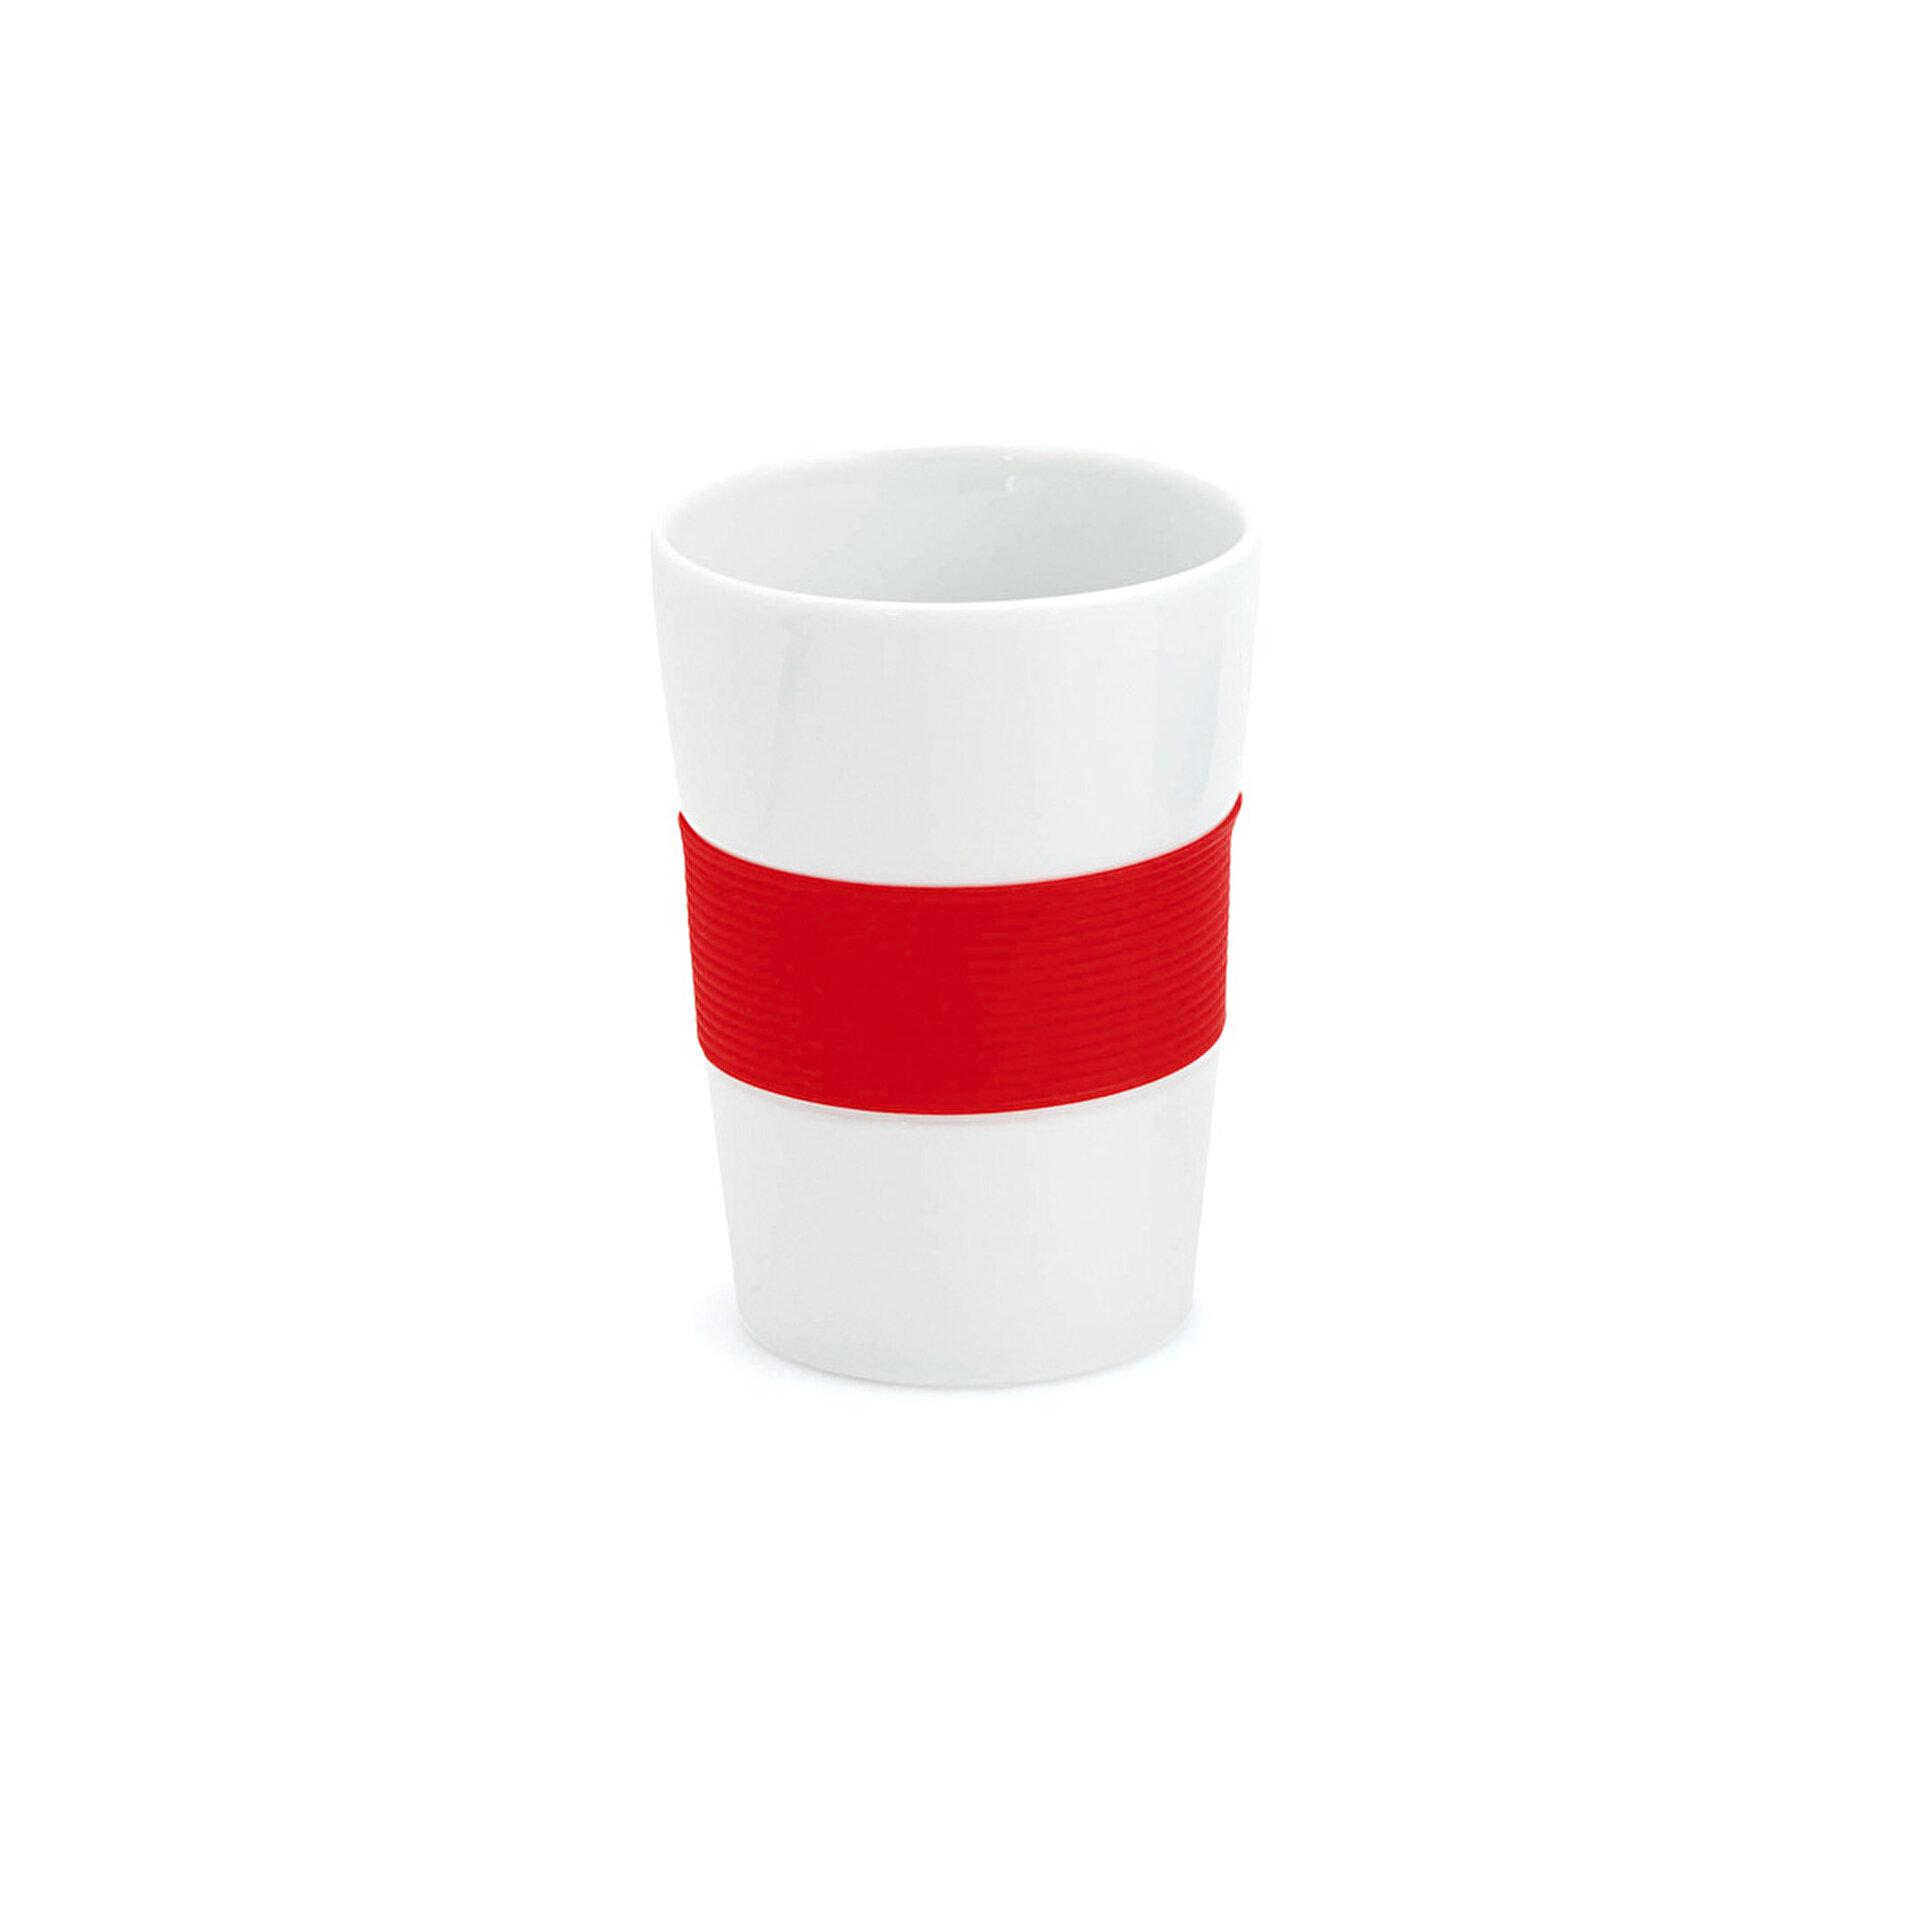 Picture of Boomug Seramik Mug